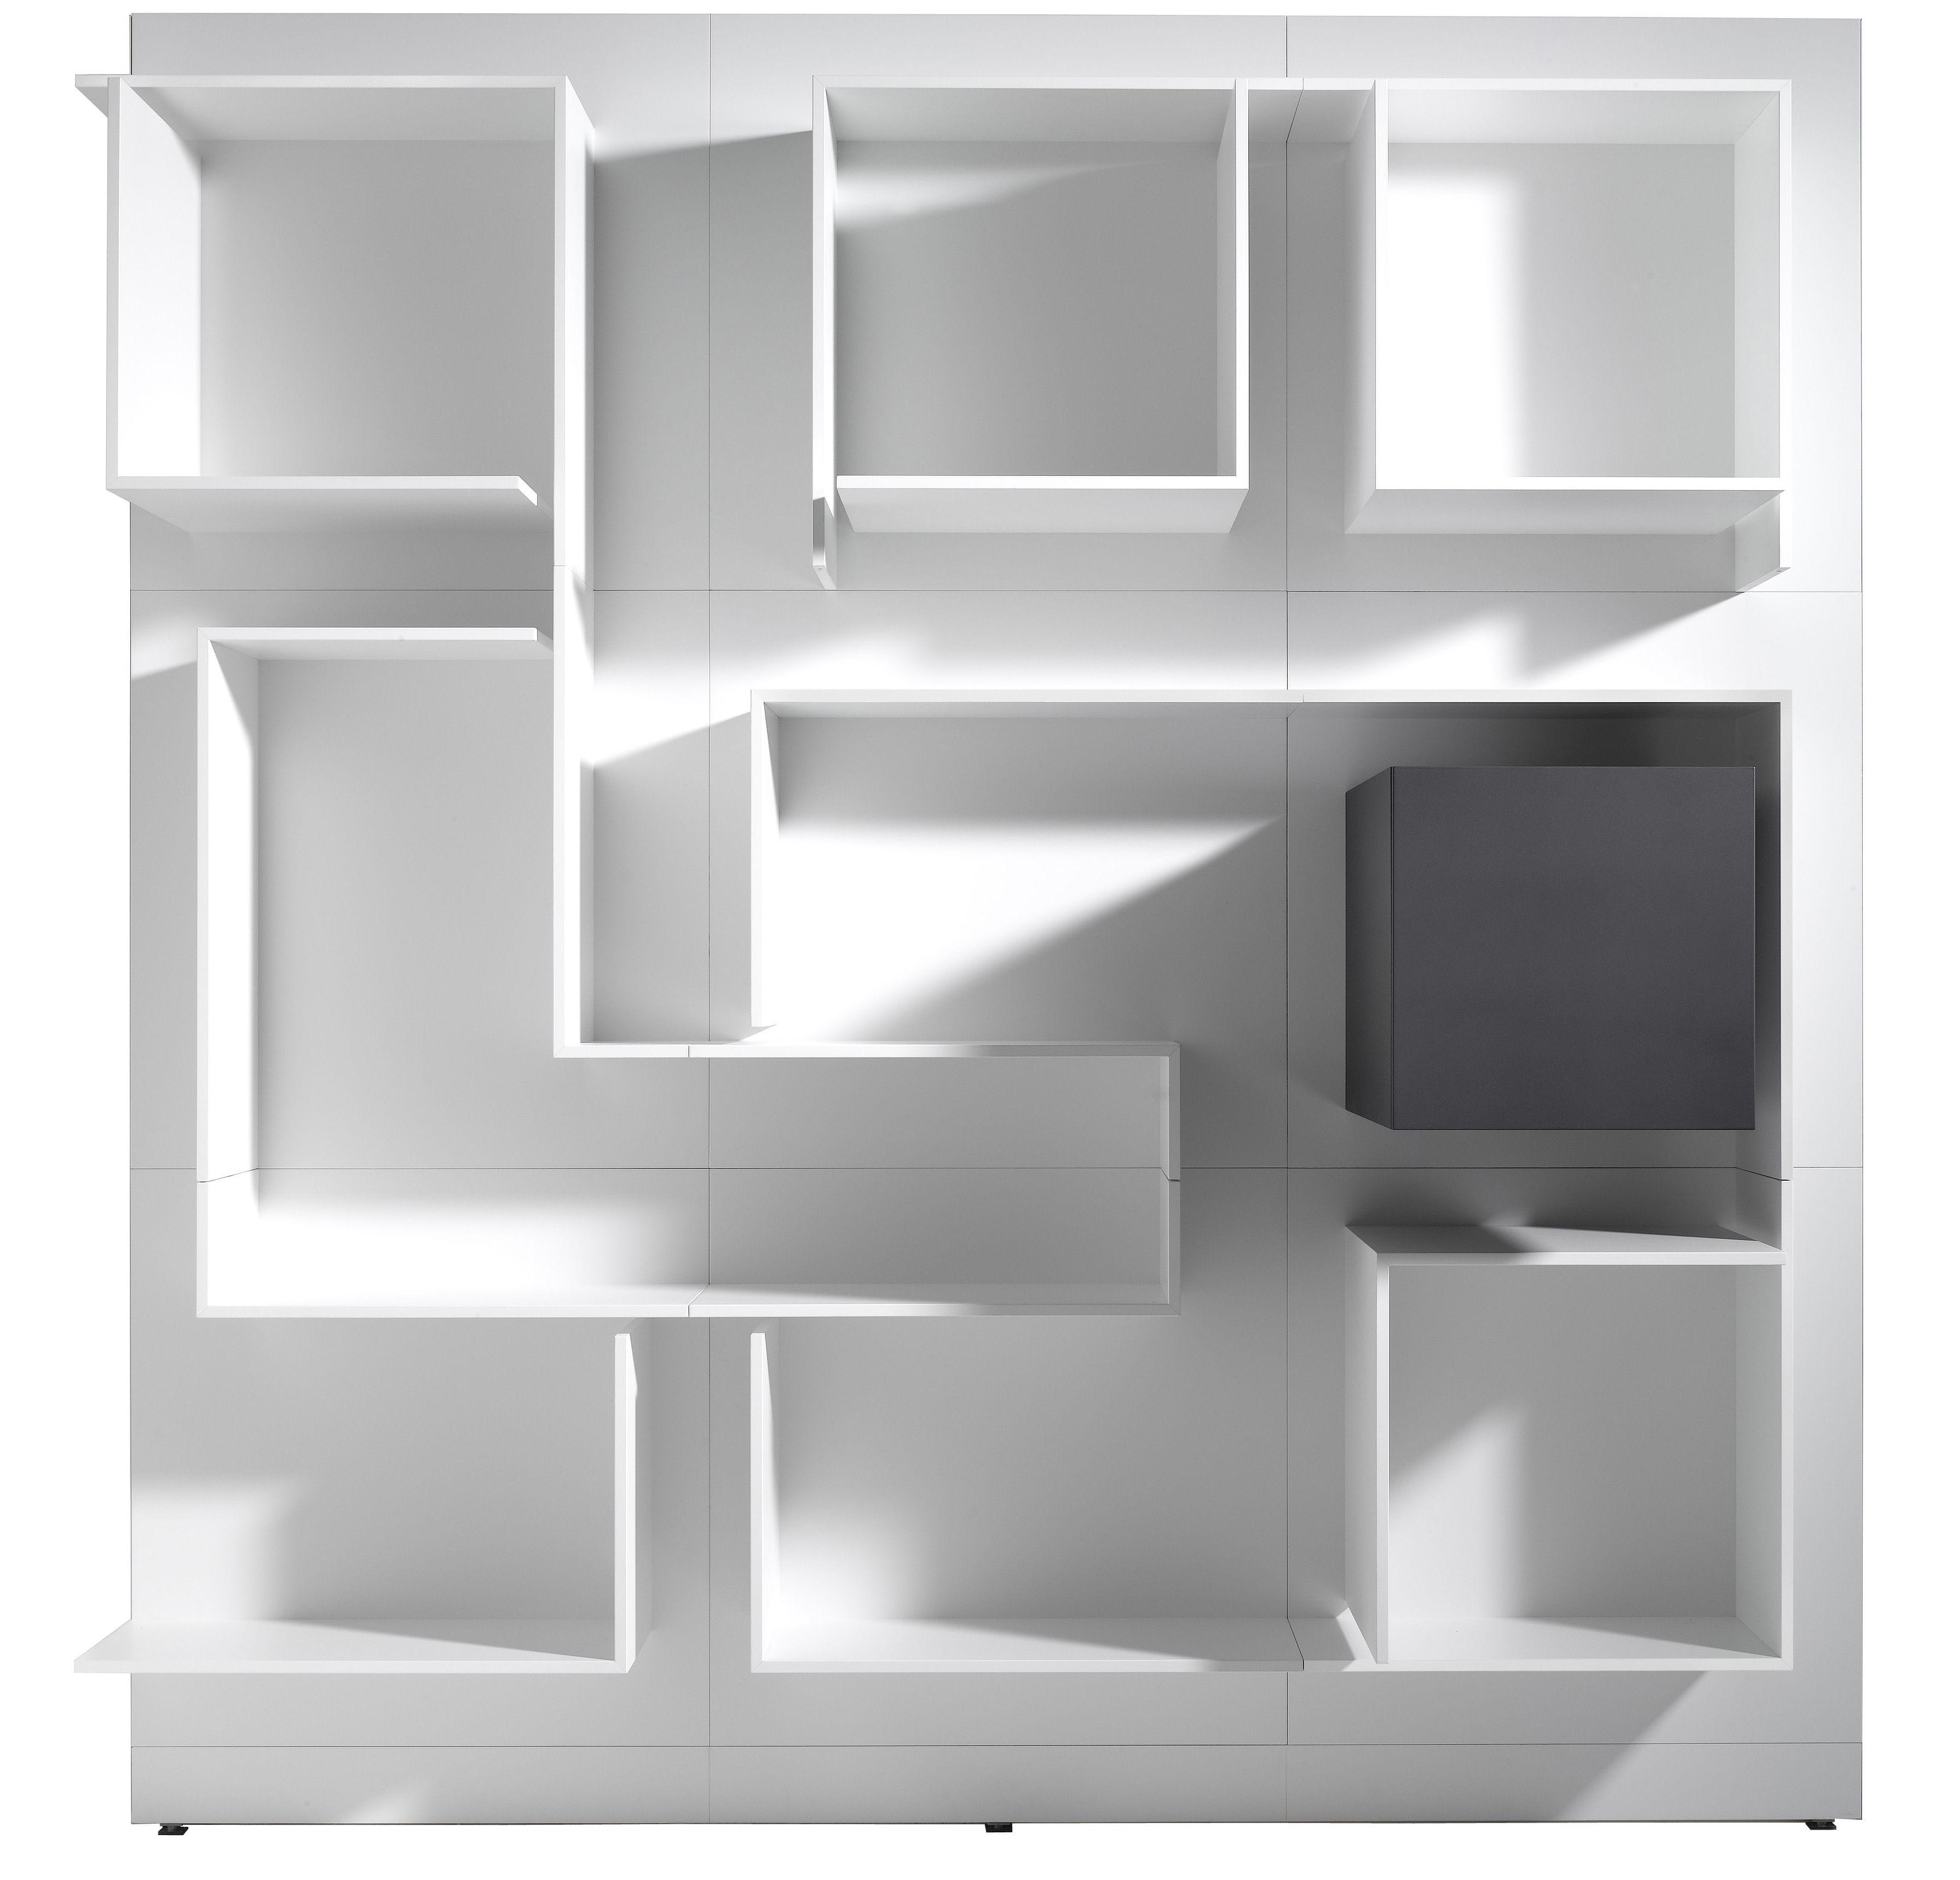 Biblioth que vita n 15 l 180 x h 180 cm composition n 15 l 180 x h 180 cm blanc avec - Mdf italia ...